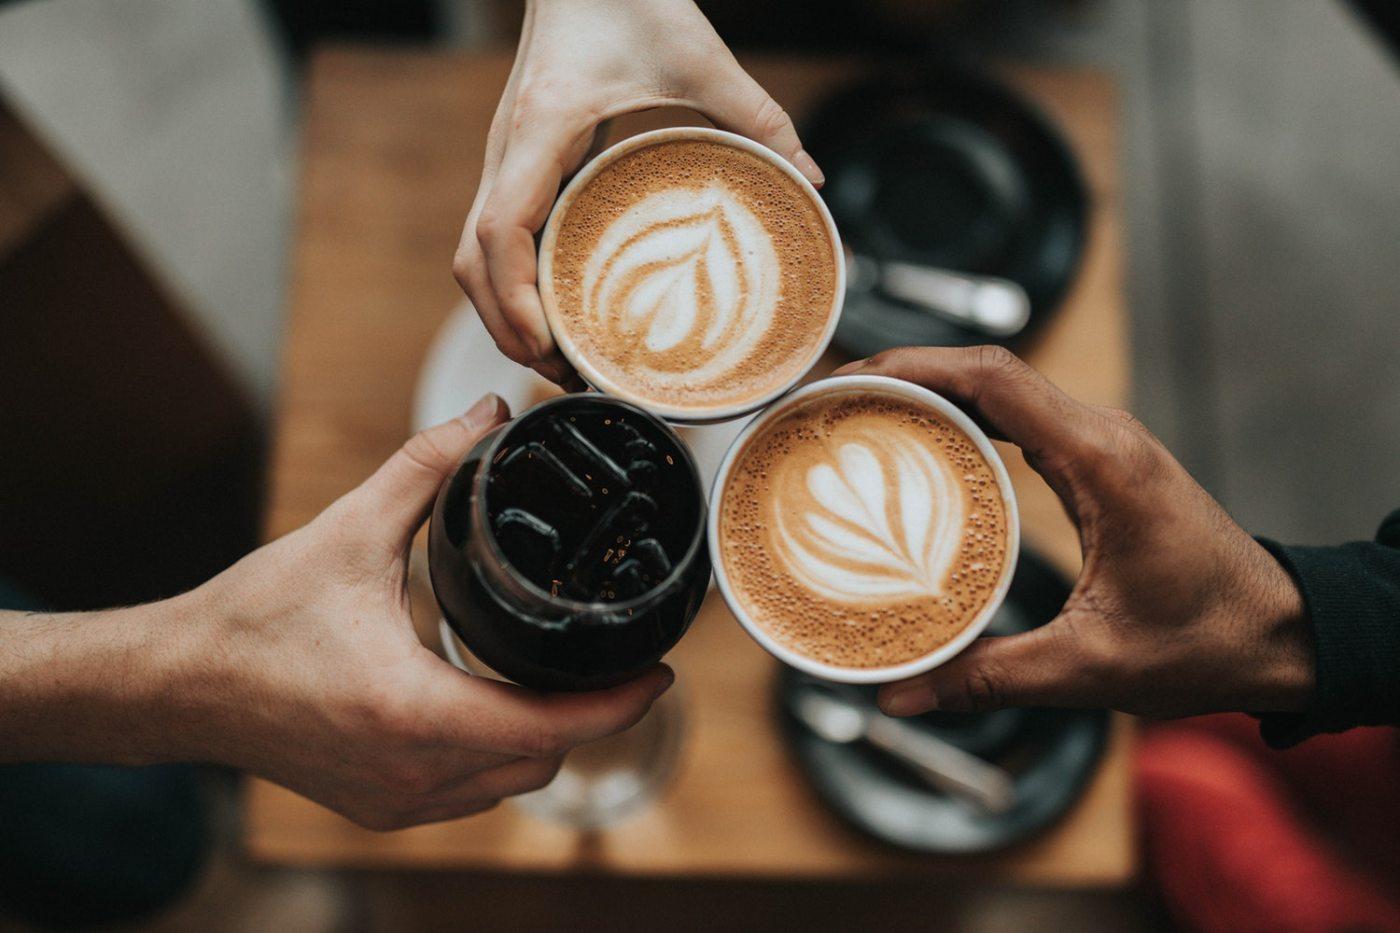 People drinking coffee